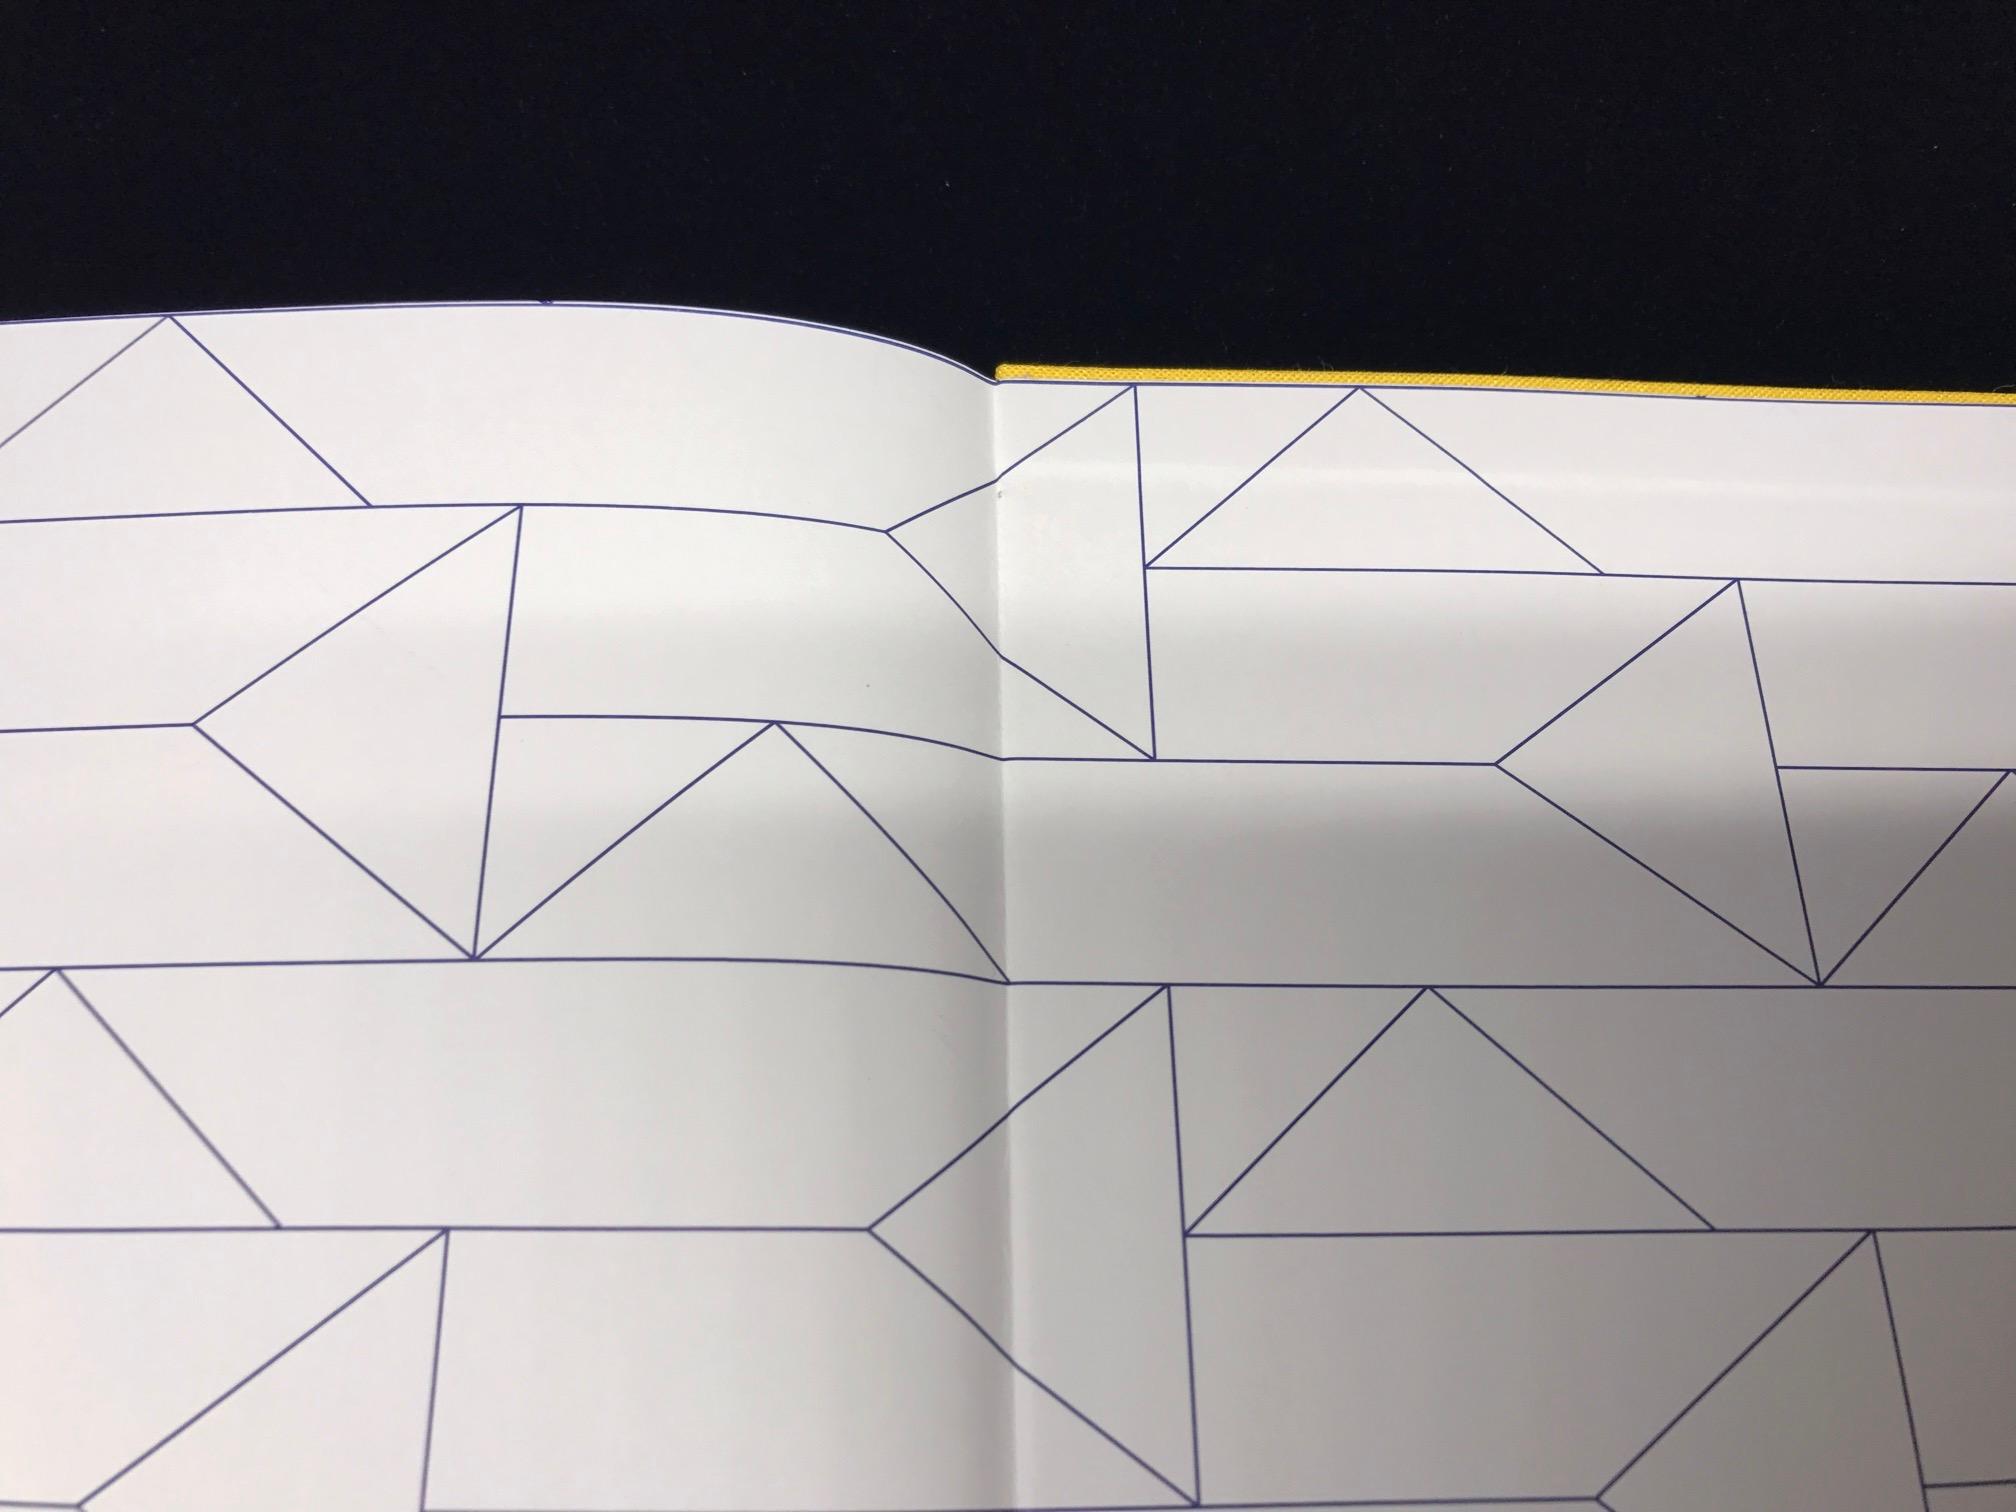 weskin-bookblock-notebook-11.jpg